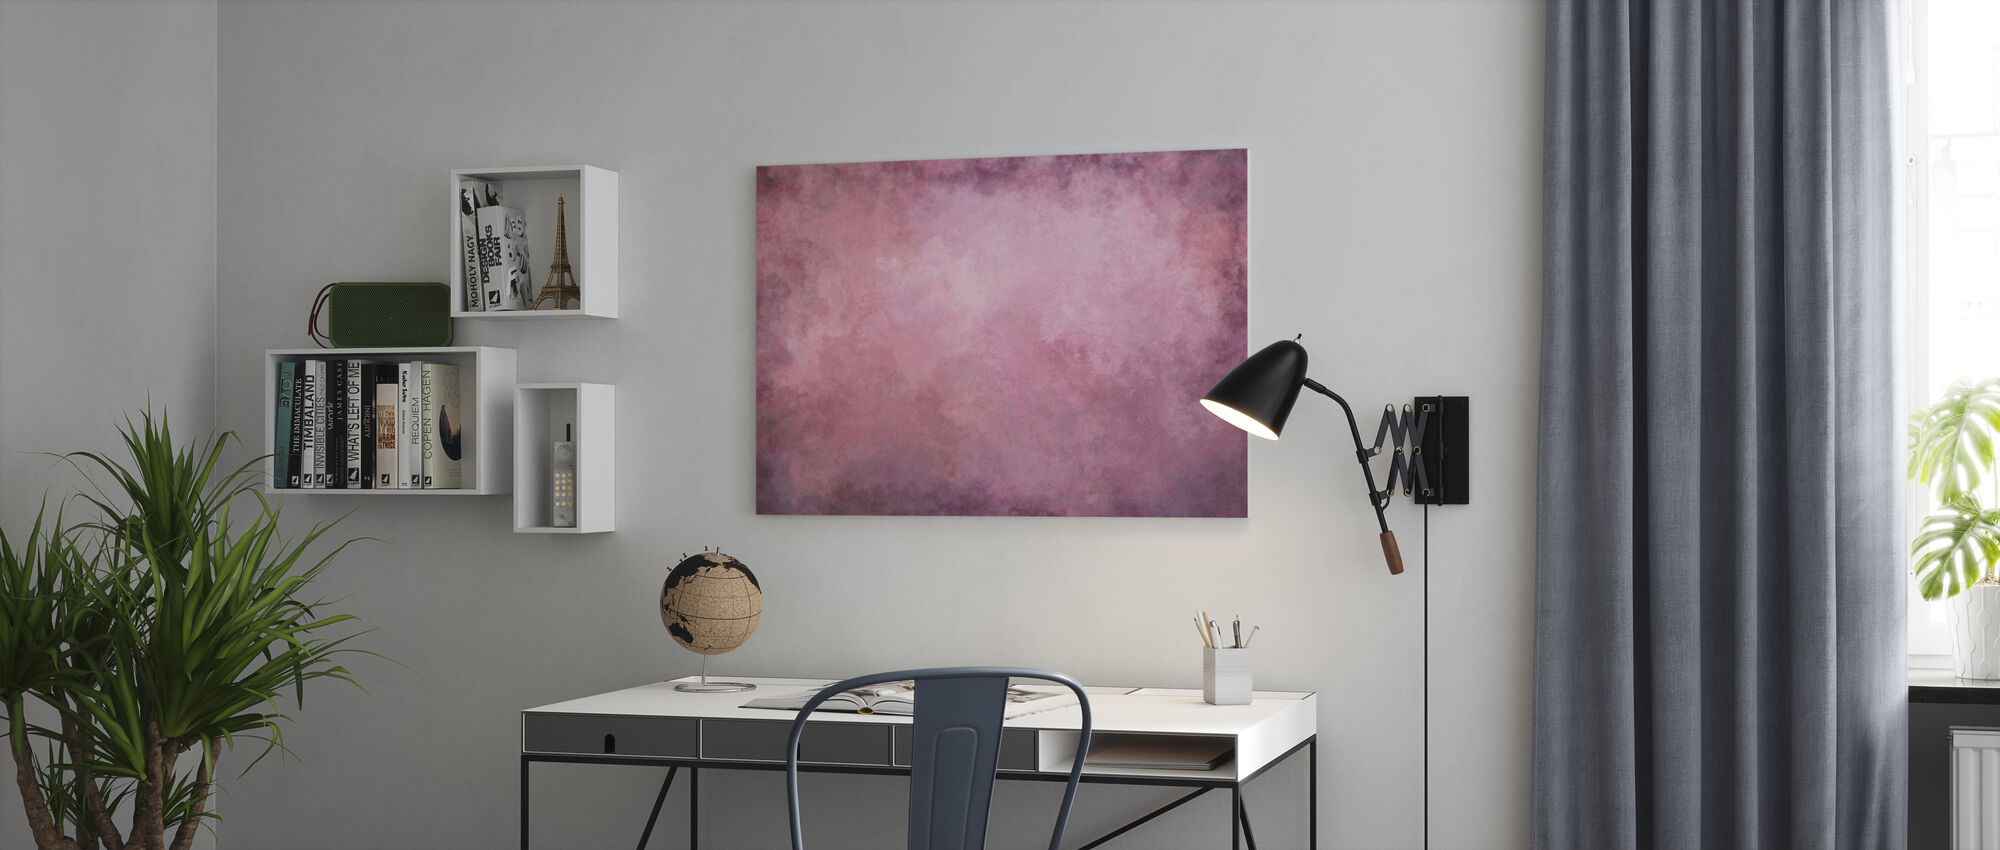 Rustica - Canvas print - Office